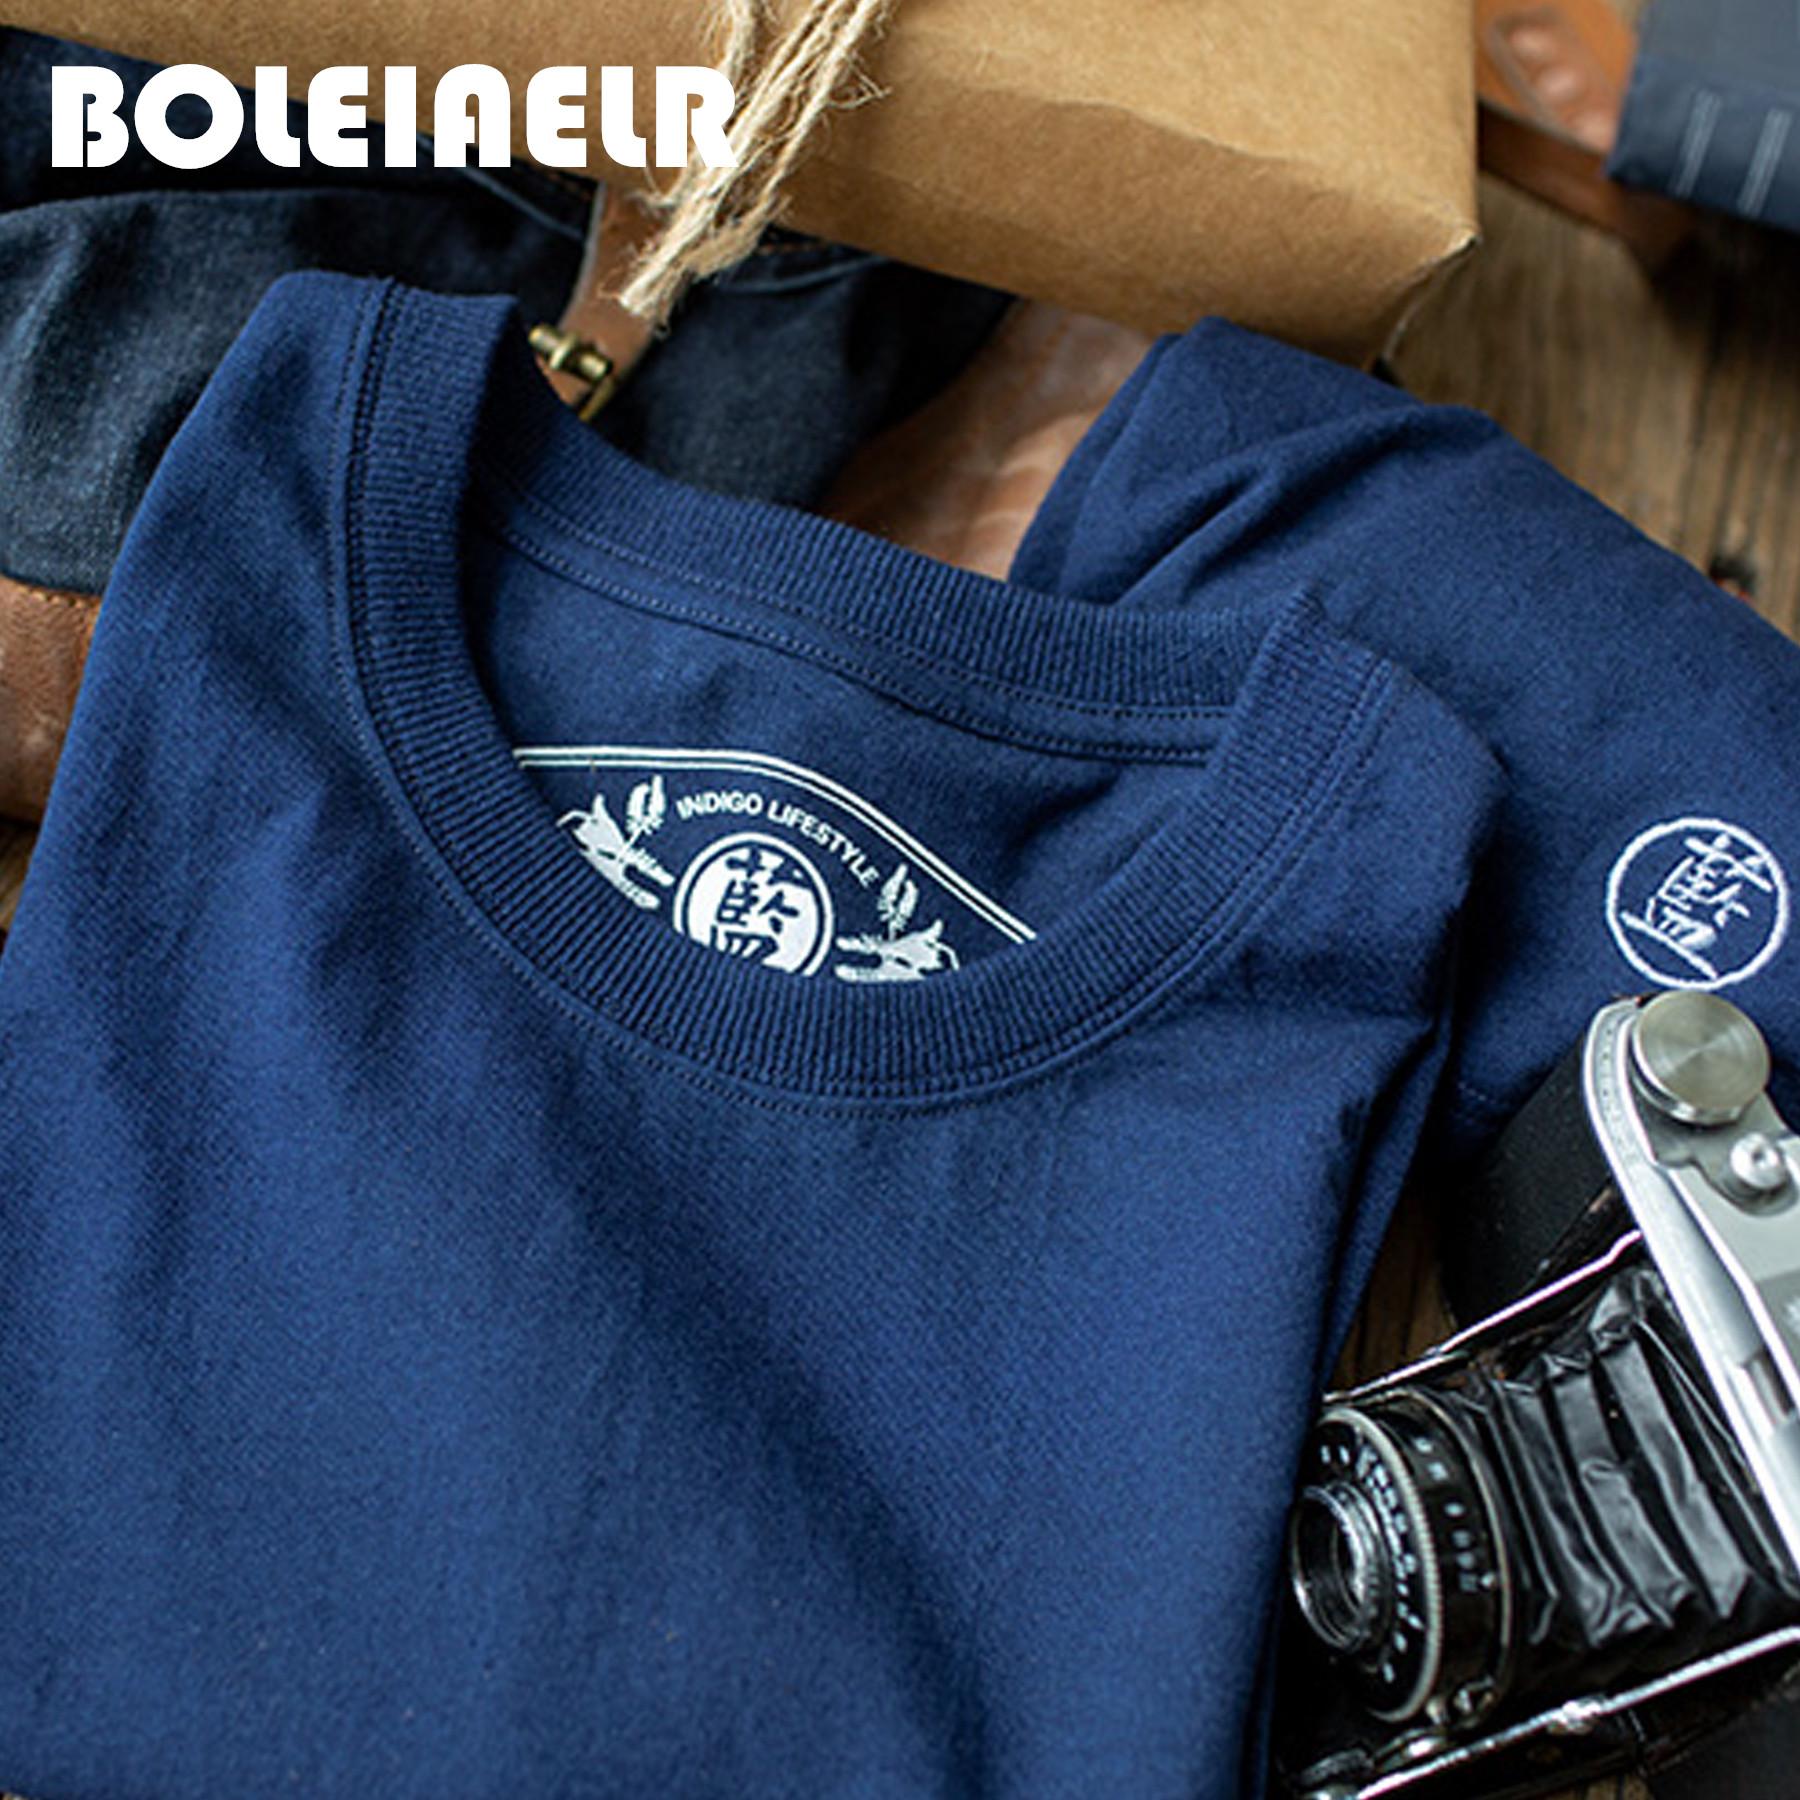 BOLEIAELR/亲肌肤 手工220g植物蓝染短袖T恤男圆领indigo纯色情侣